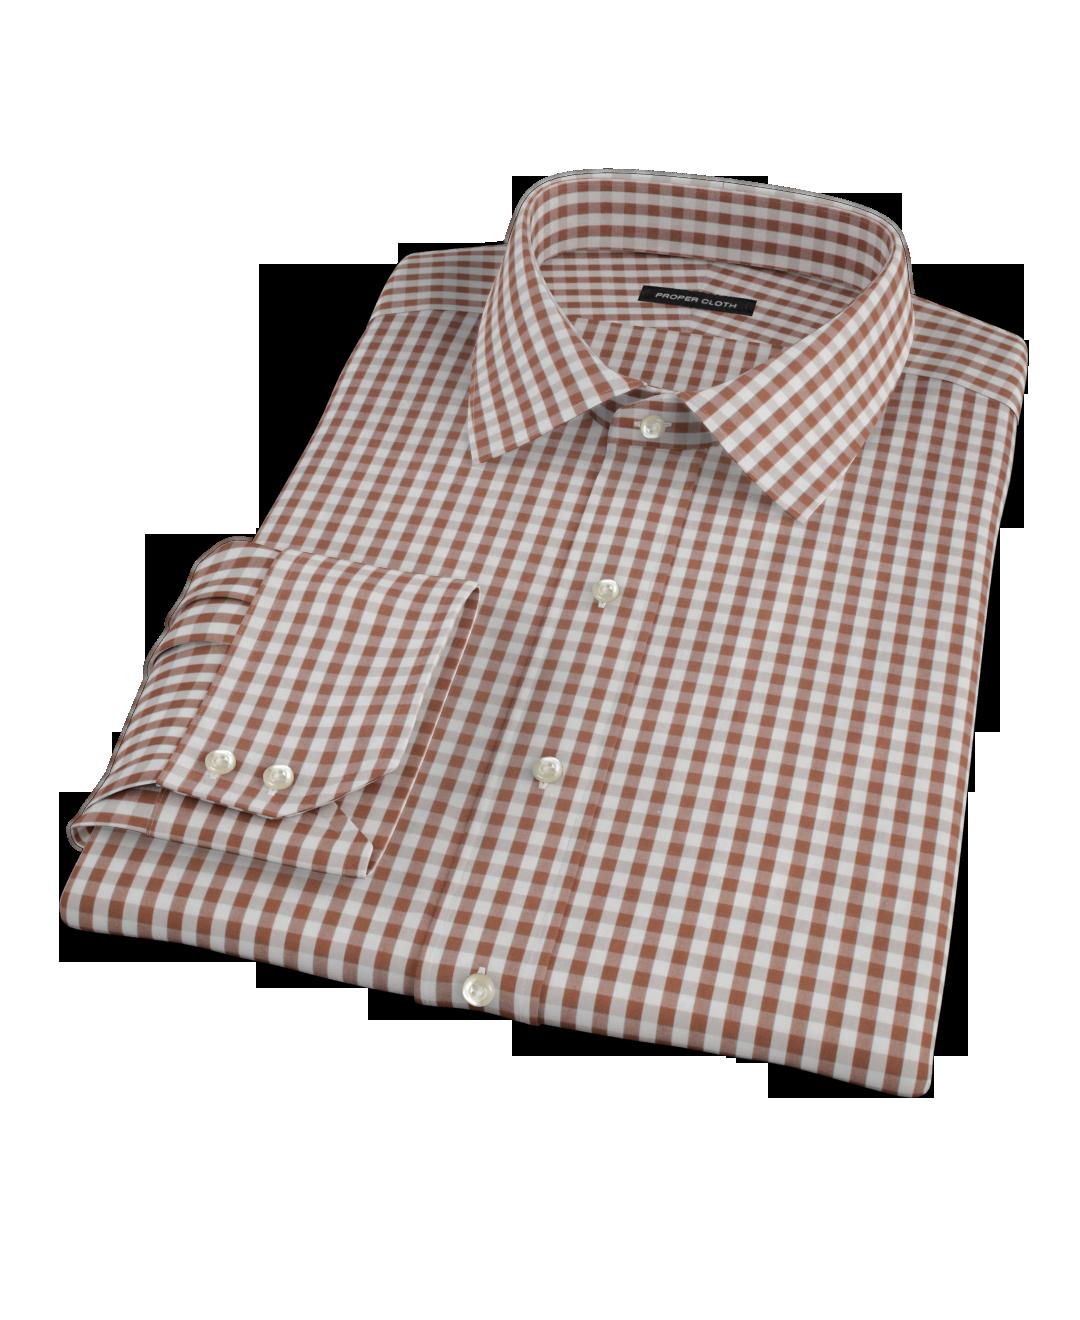 Clove brown gingham men 39 s dress shirt by proper cloth for Mens gingham dress shirt